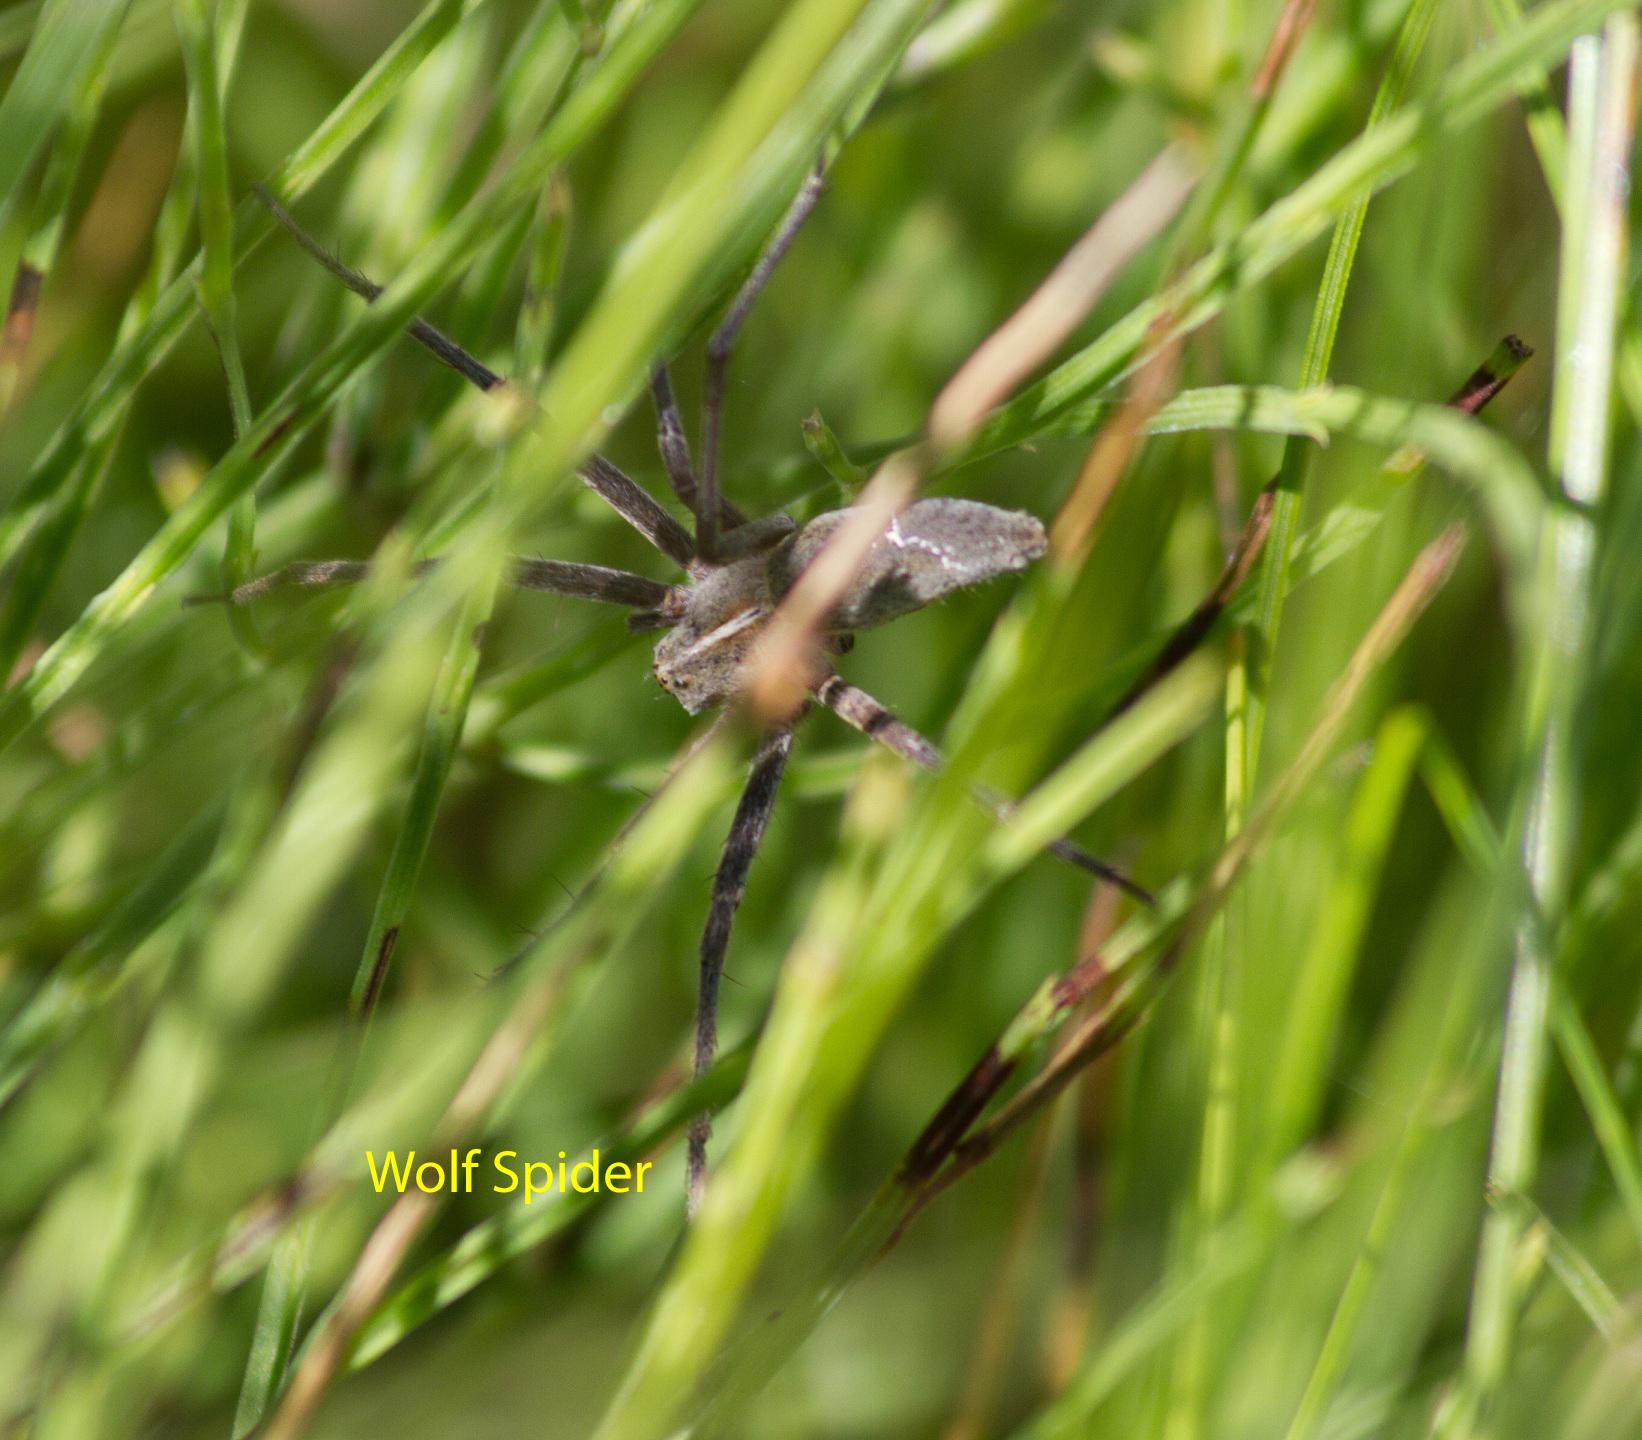 028-wolf-spider-1-1-b8177afbd76321939741af1dca31abaa0448863a